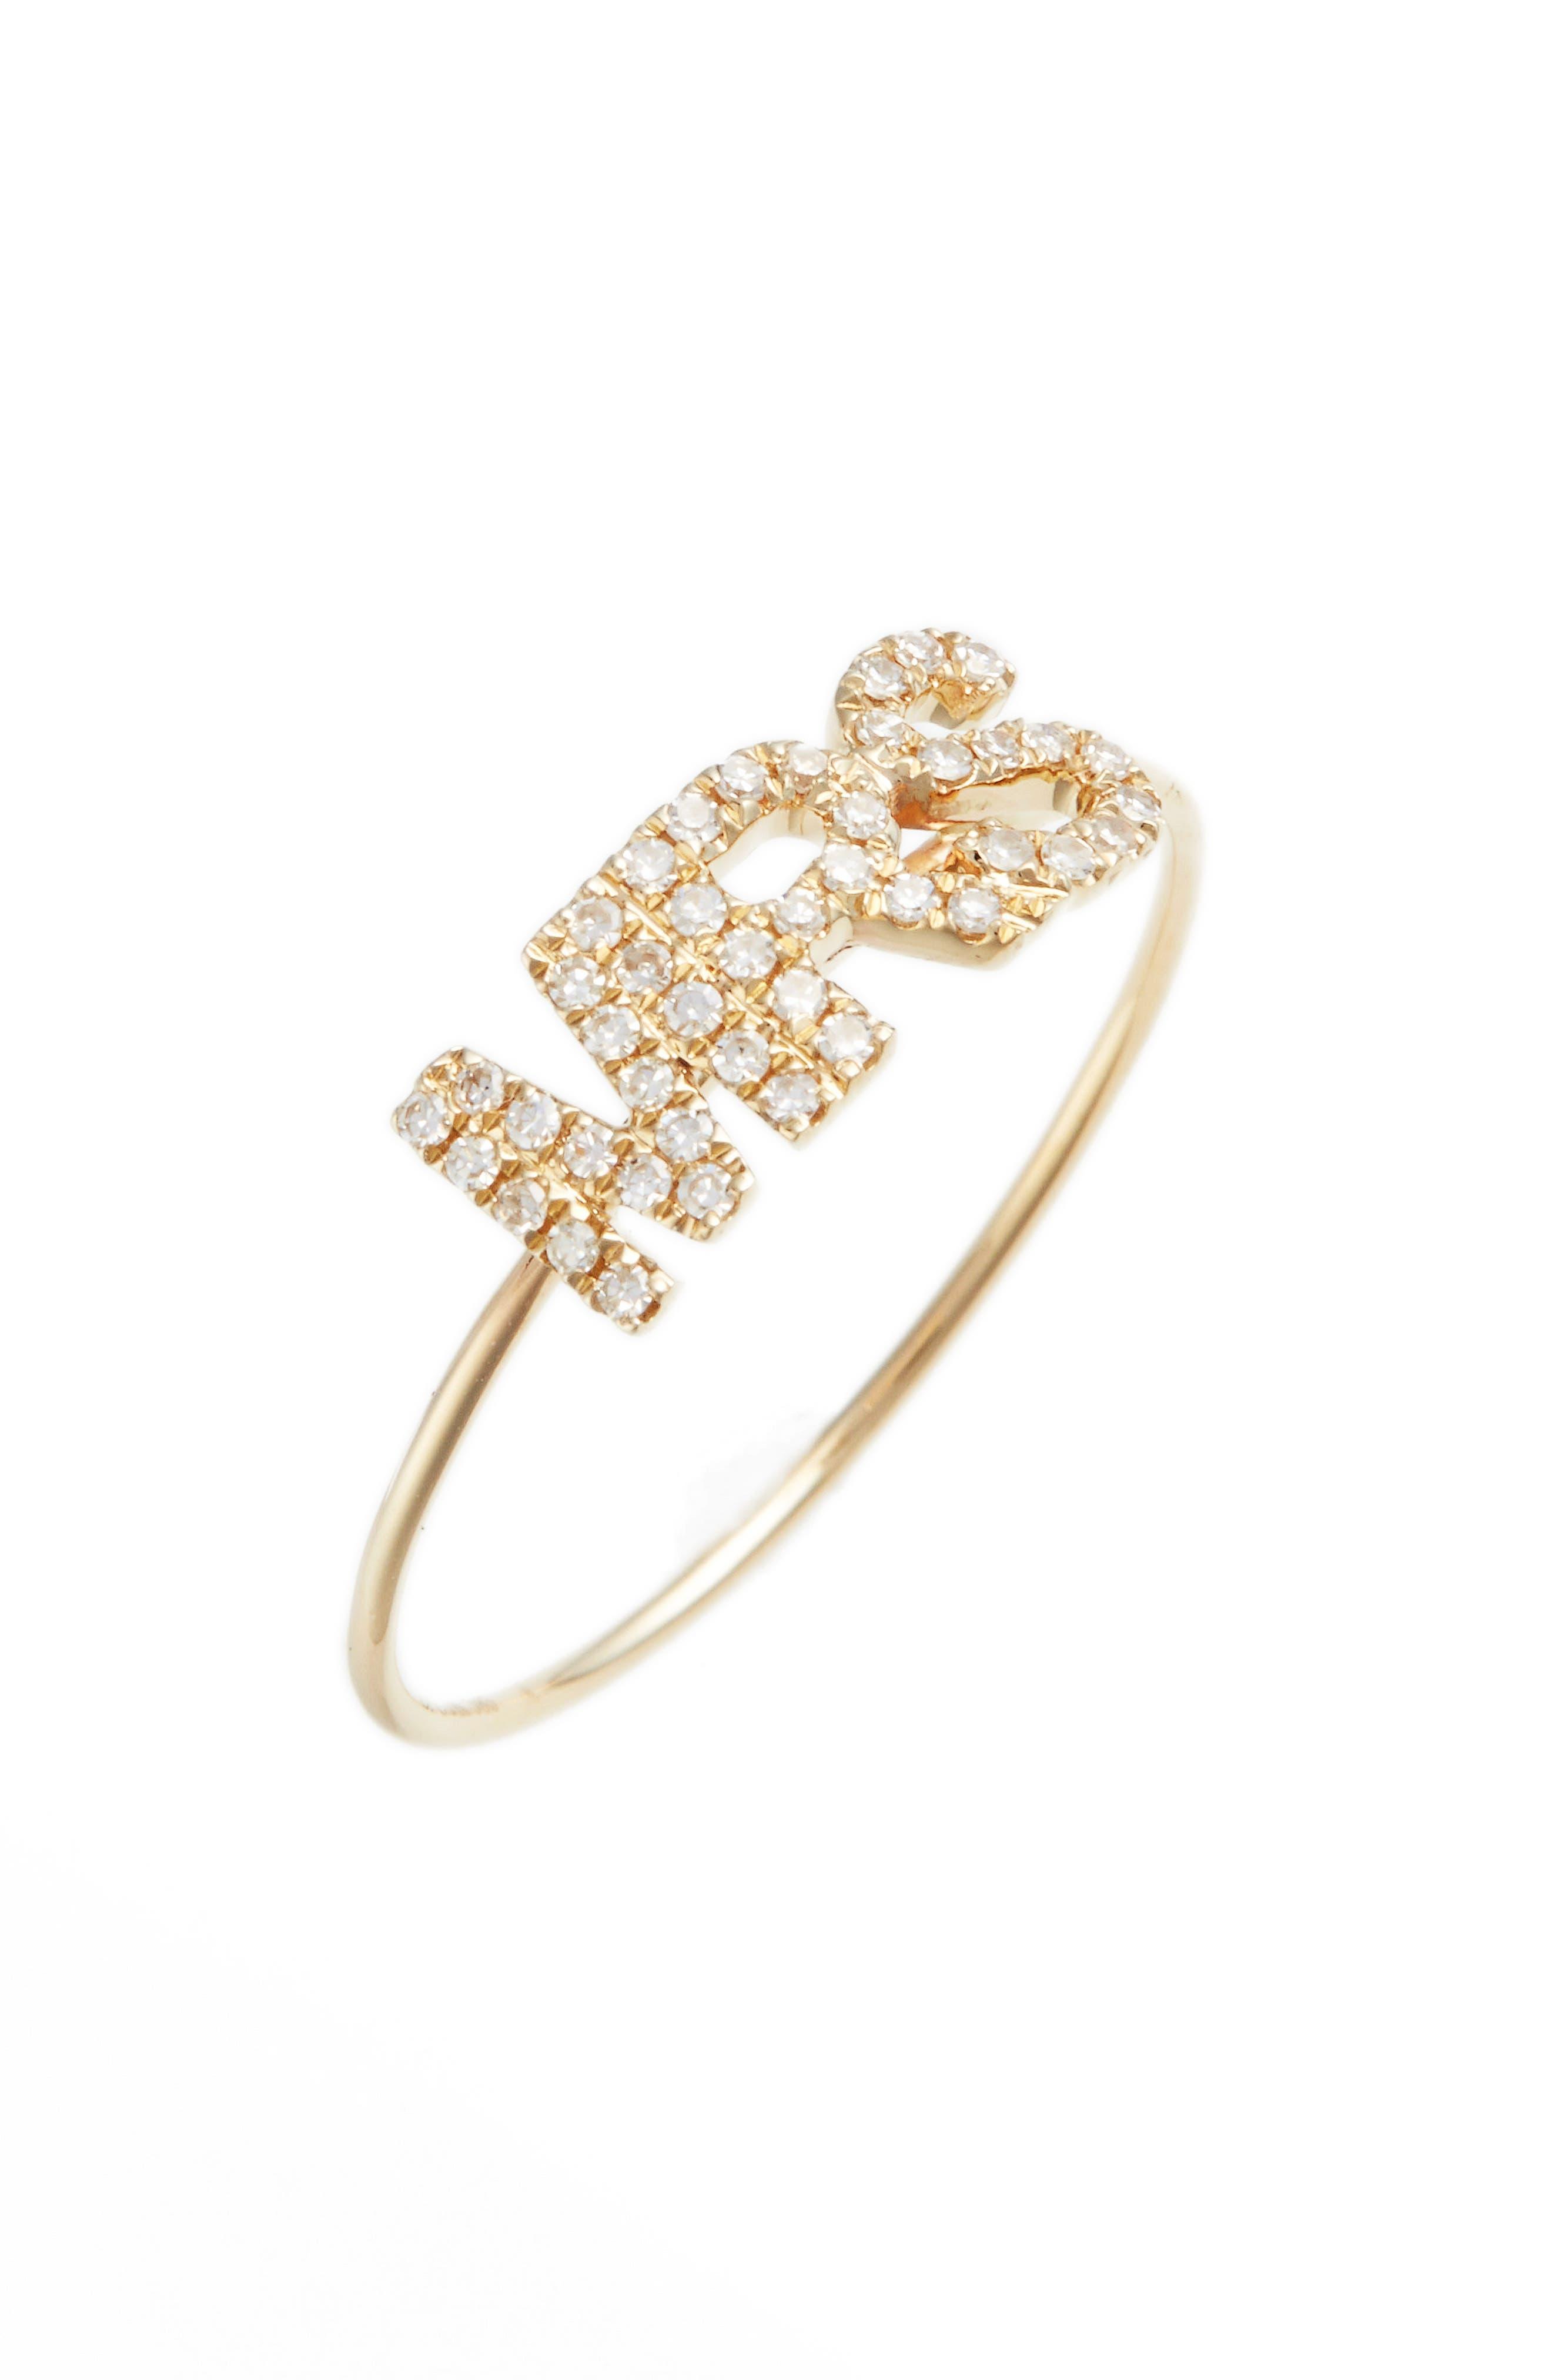 Mrs. Diamond Ring,                         Main,                         color, YELLOW GOLD